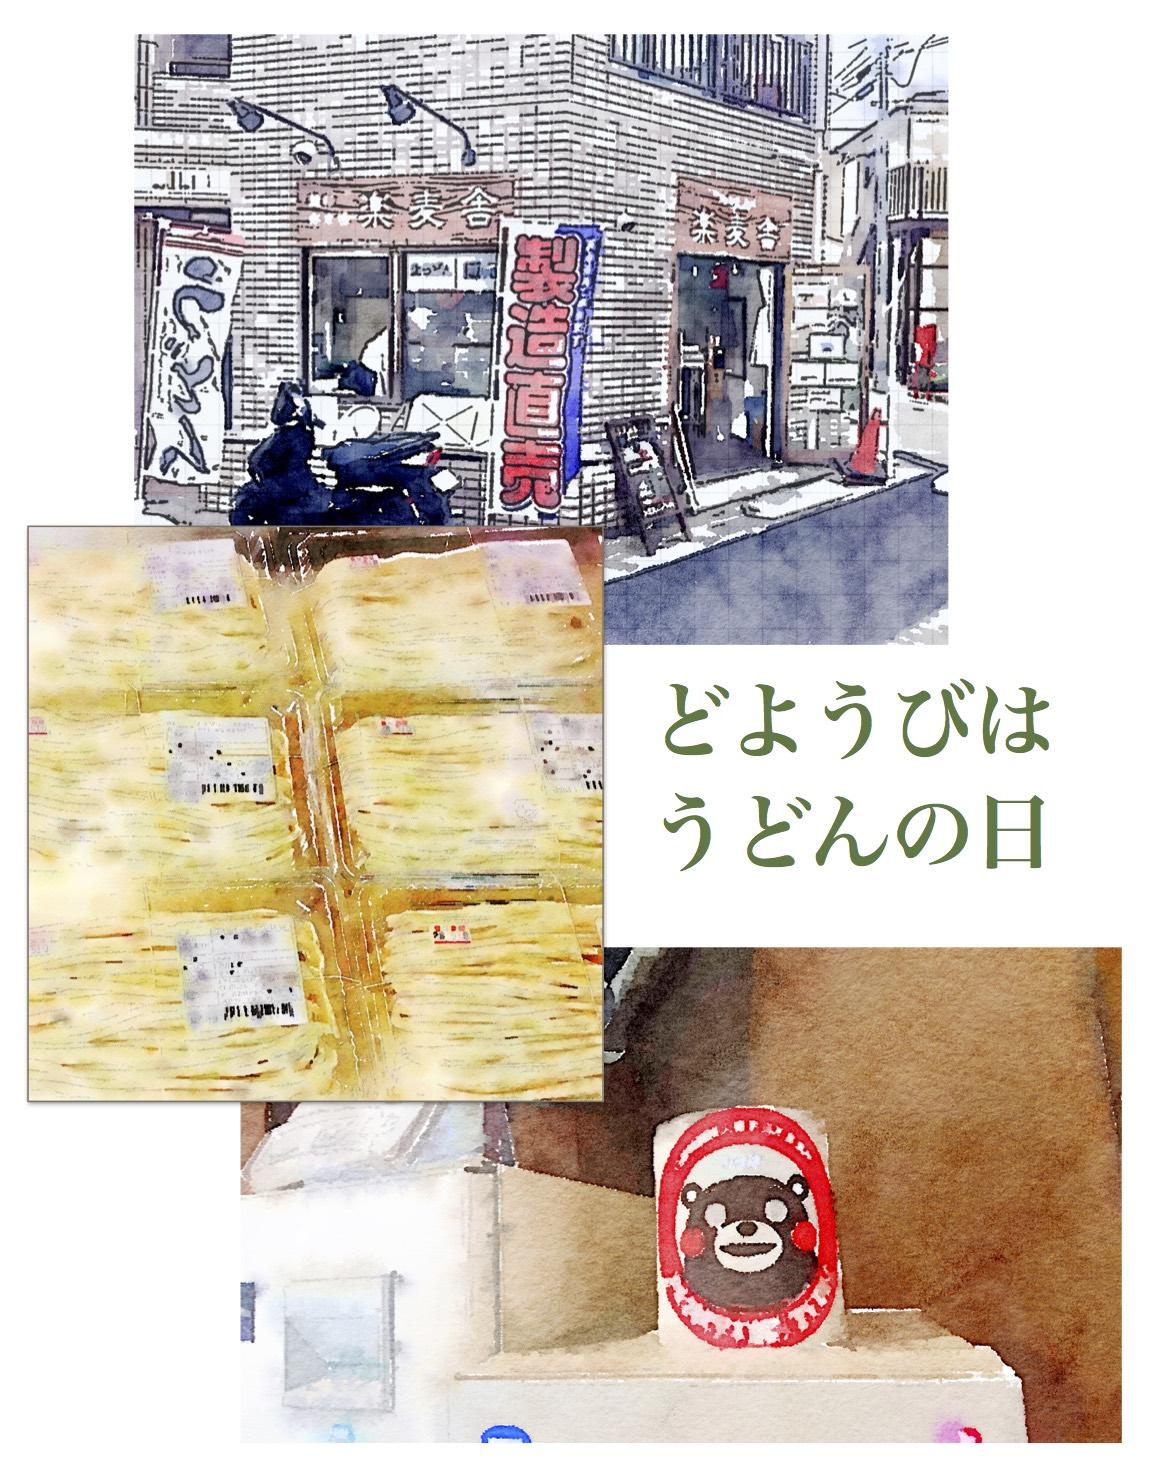 http://blog-imgs-91.fc2.com/t/o/k/tokyoramen/201606091042395c2.jpg